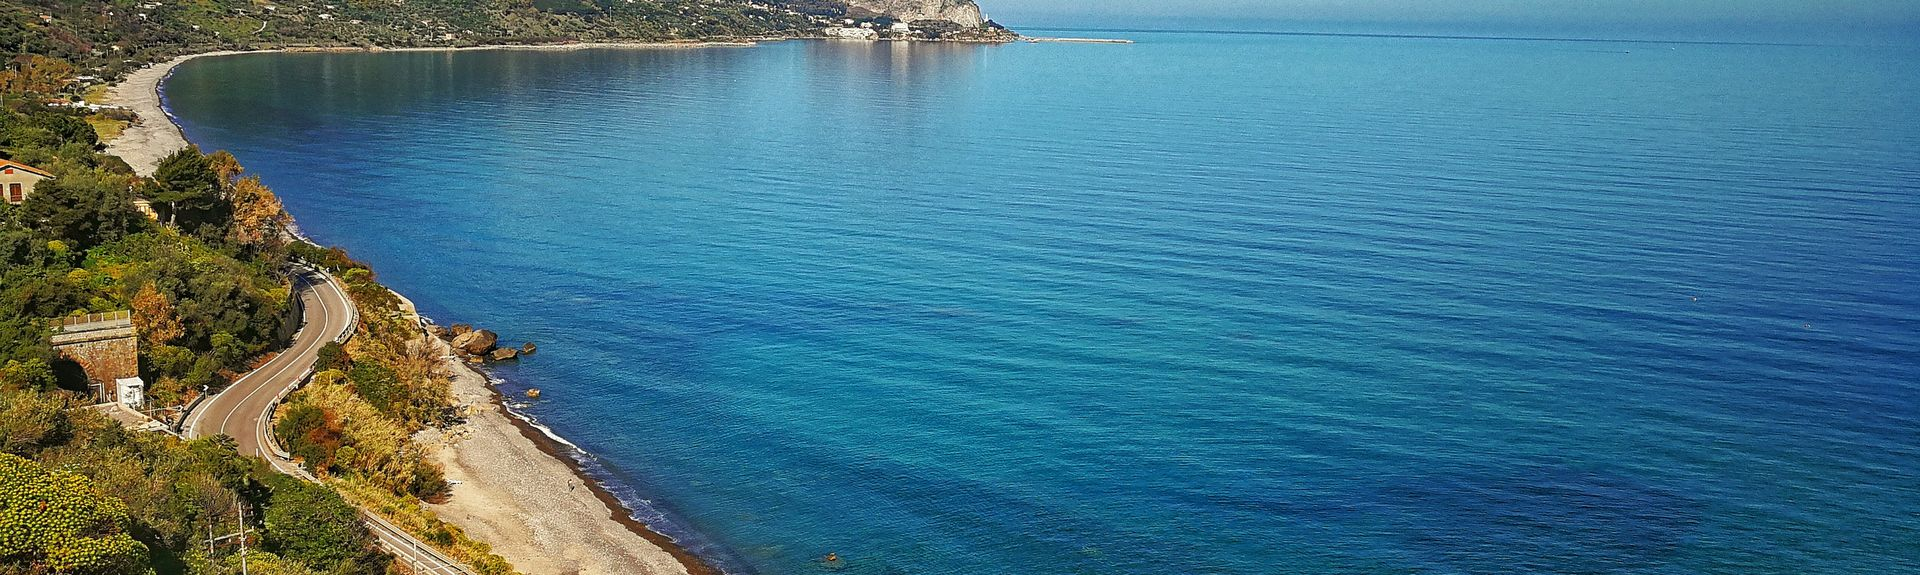 Mazzaforno, Palermo, Sicily, Italy